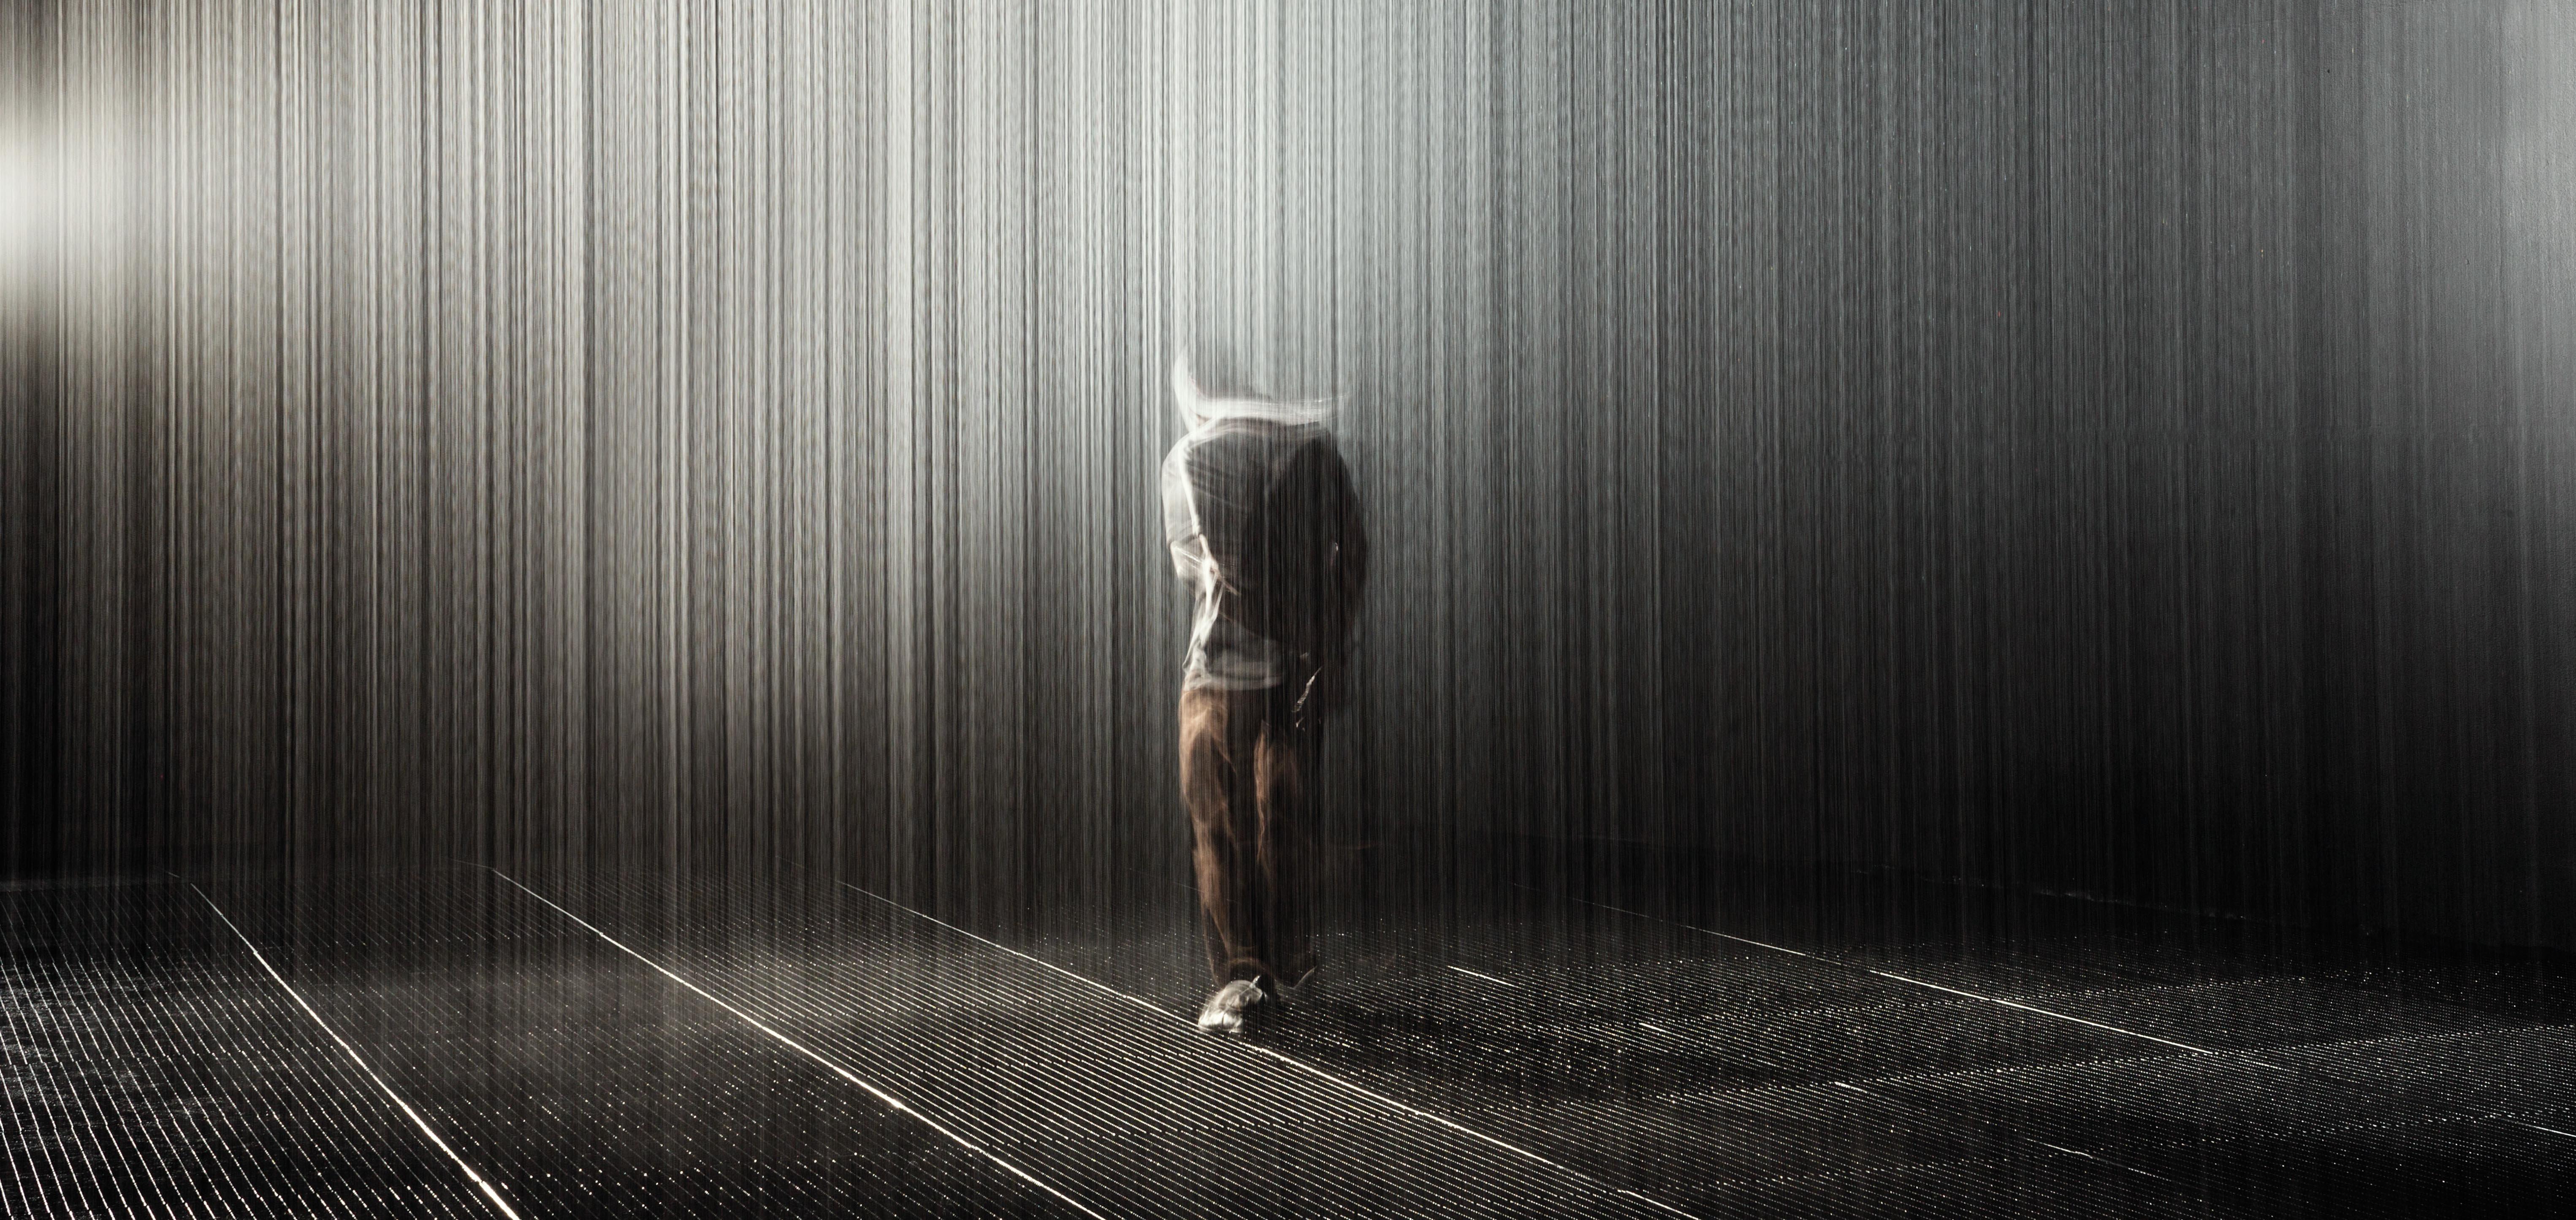 A person experiencing Rain Room -  image courtesy of RANDOM INTERNATIONAL - hero image